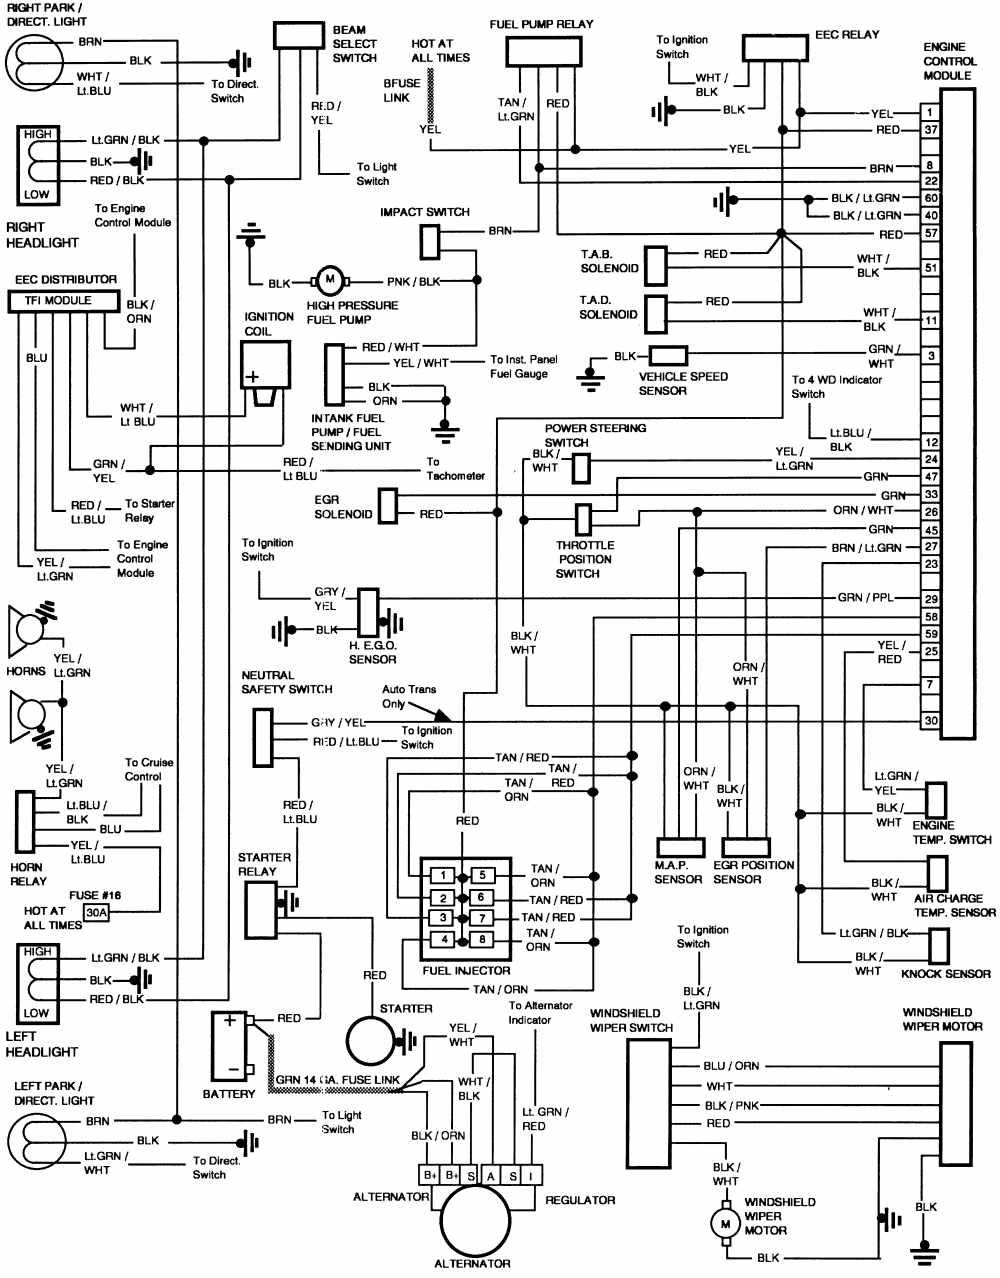 [ZHKZ_3066]  KW_3369] Vauxhall Brava Wiring Diagram Wiring Diagram | Orthman Wiring Diagram |  | Arnes Elec Mohammedshrine Librar Wiring 101